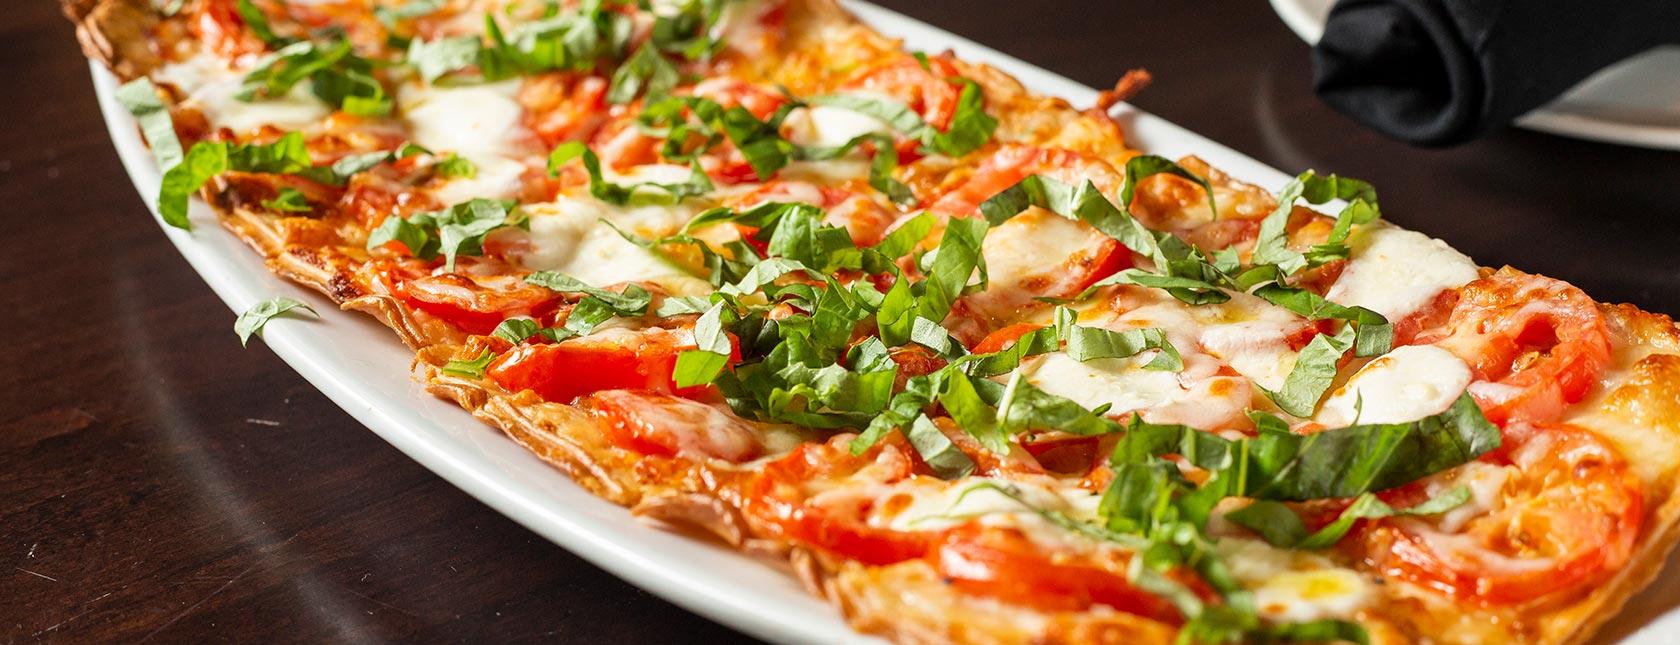 Flatbread pizza with basil garnish